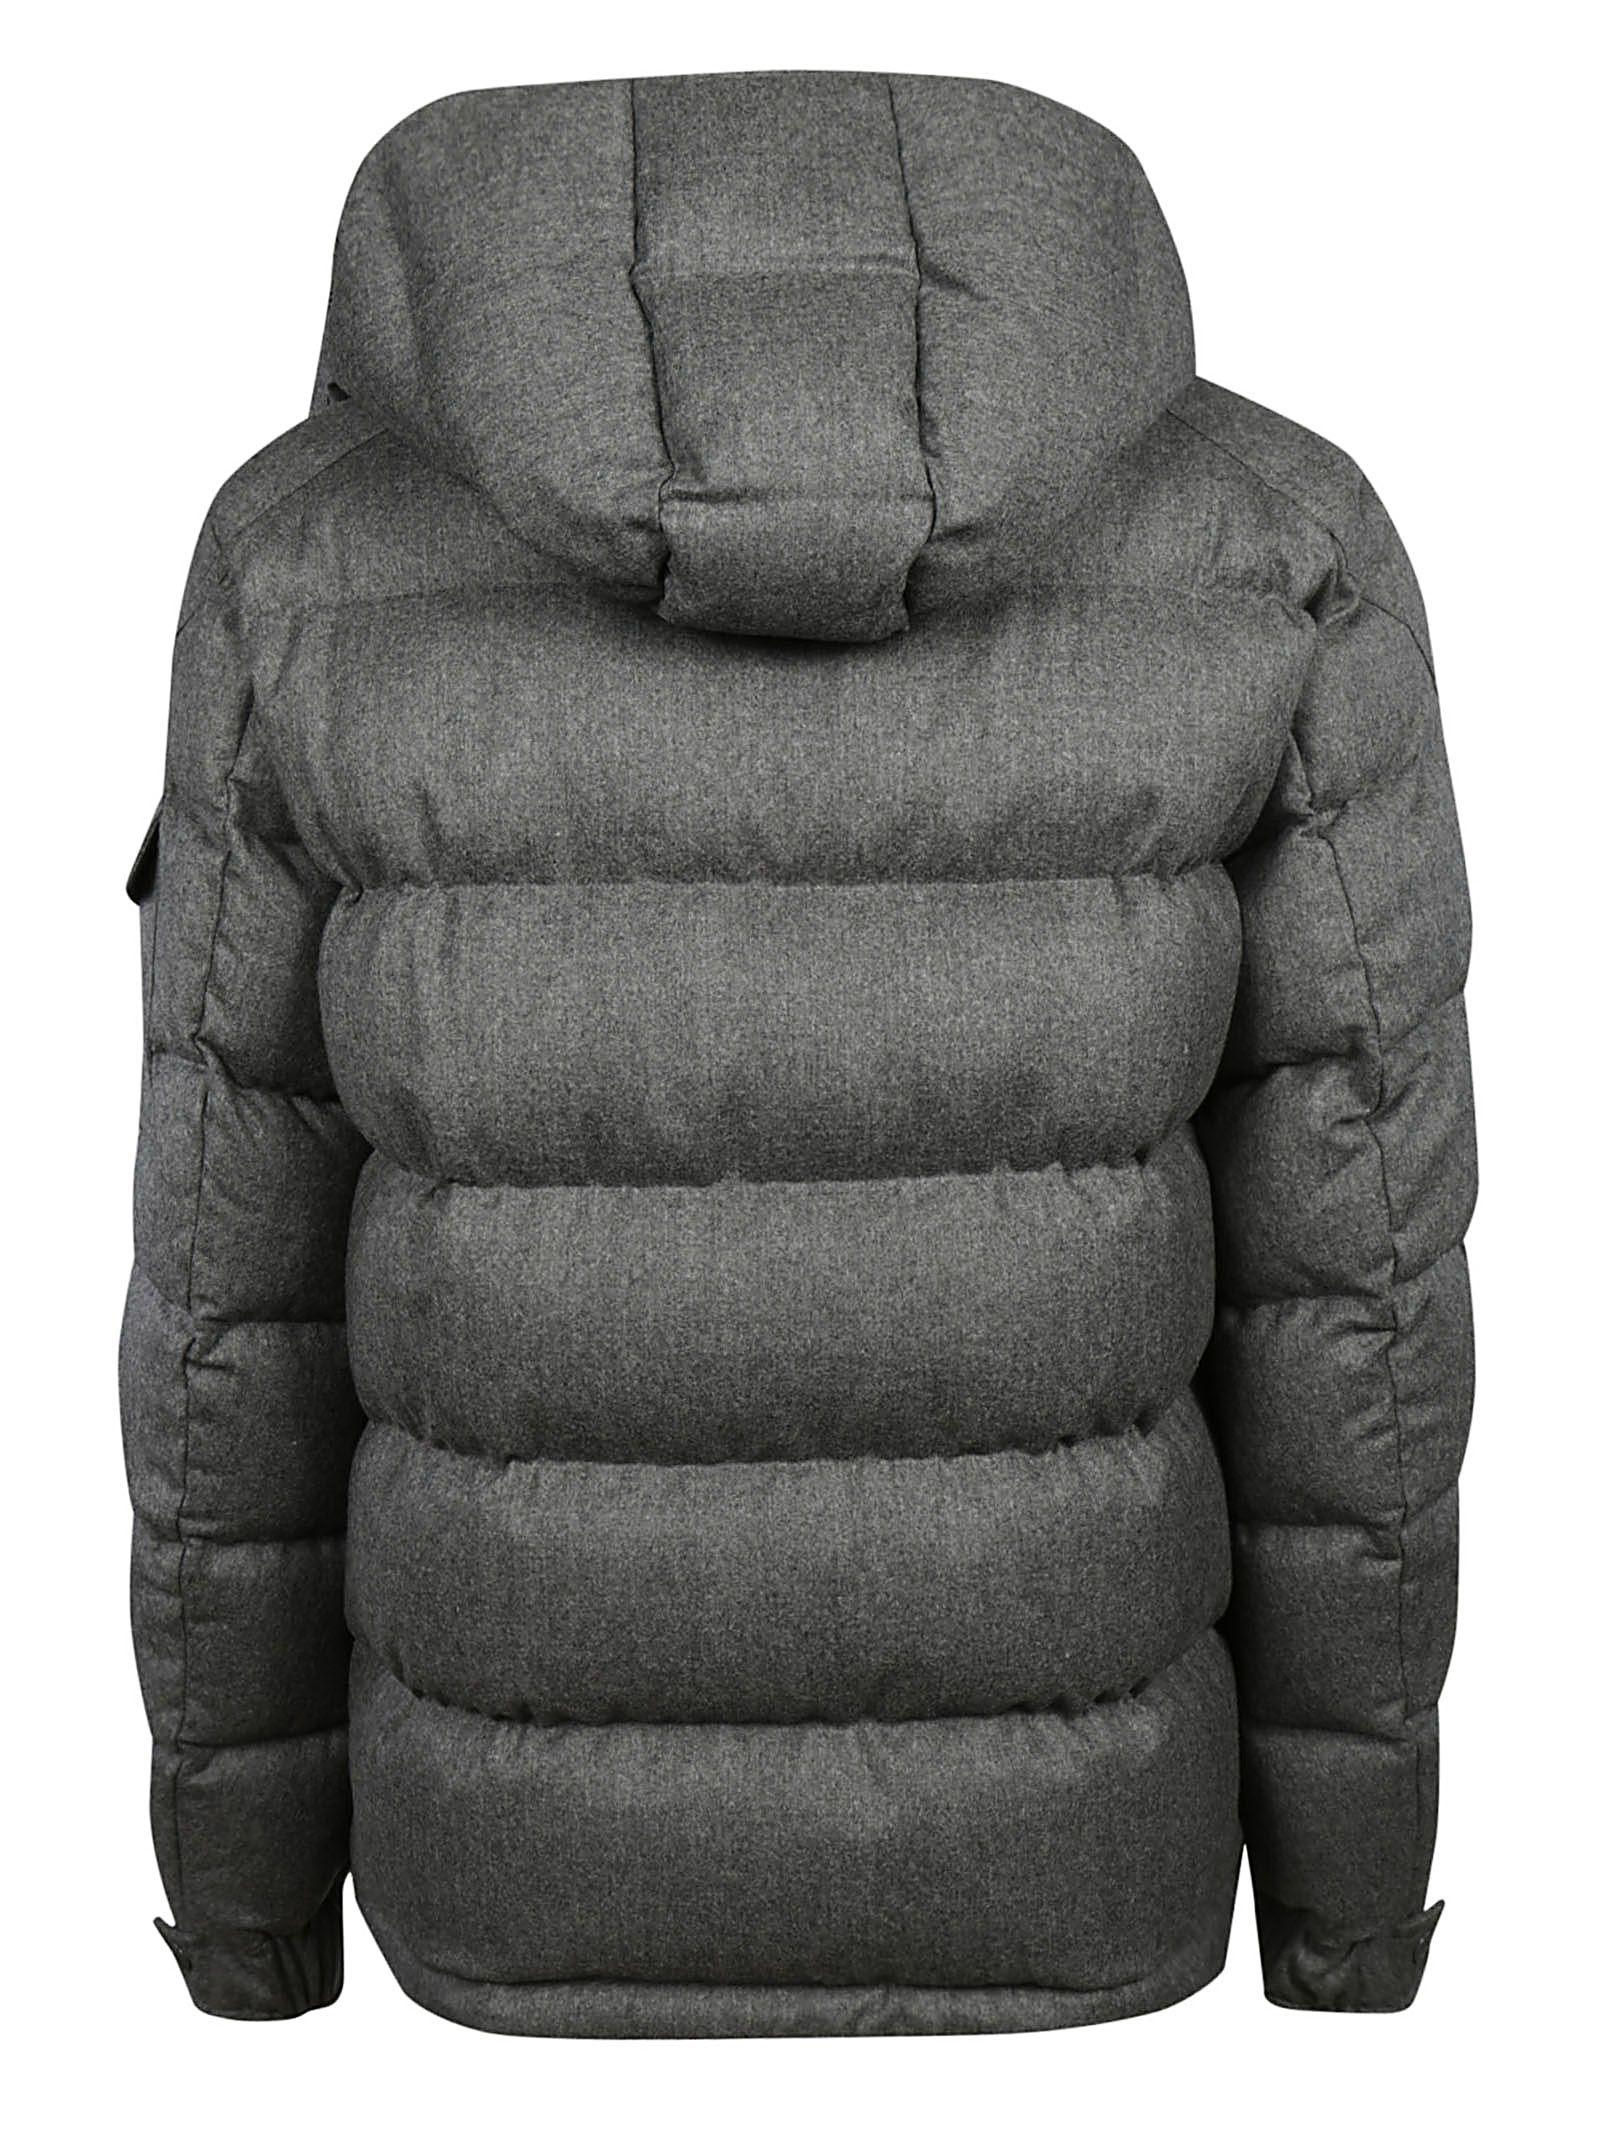 Moncler Montgenevre Padded Jacket - Antracite Moncler Montgenevre Padded Jacket - Antracite